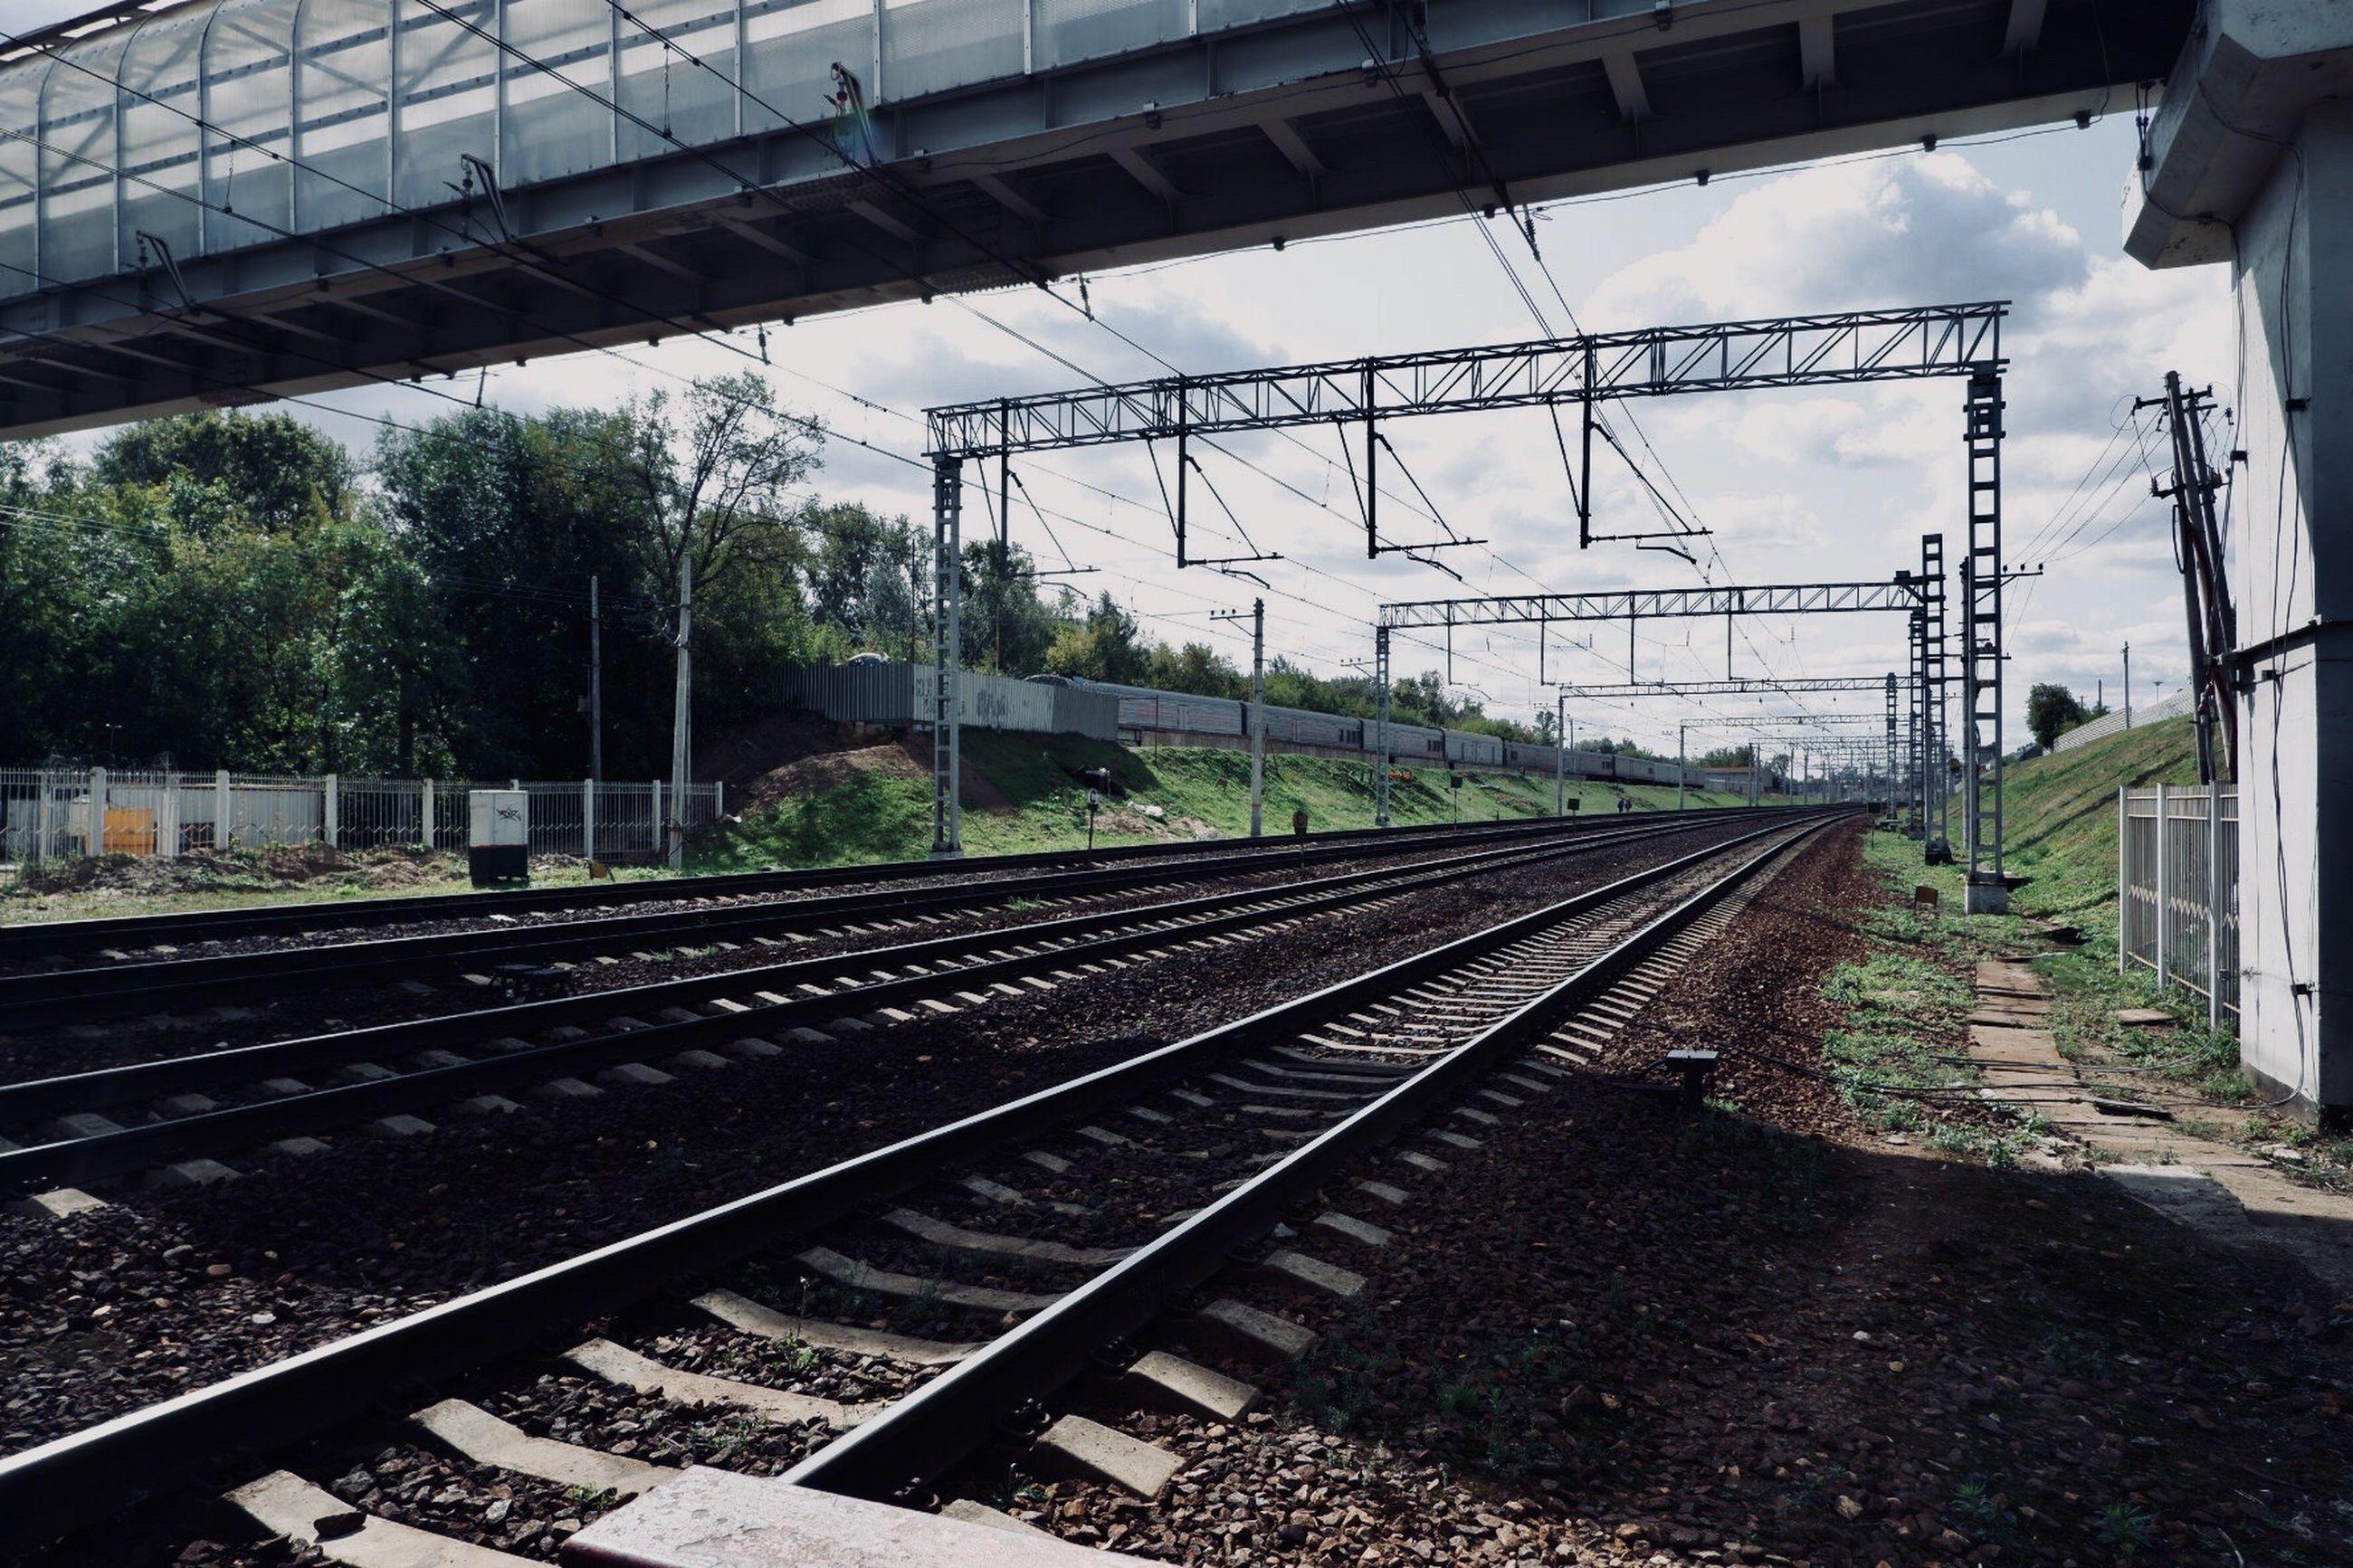 Bridge over railroad tracks against sky